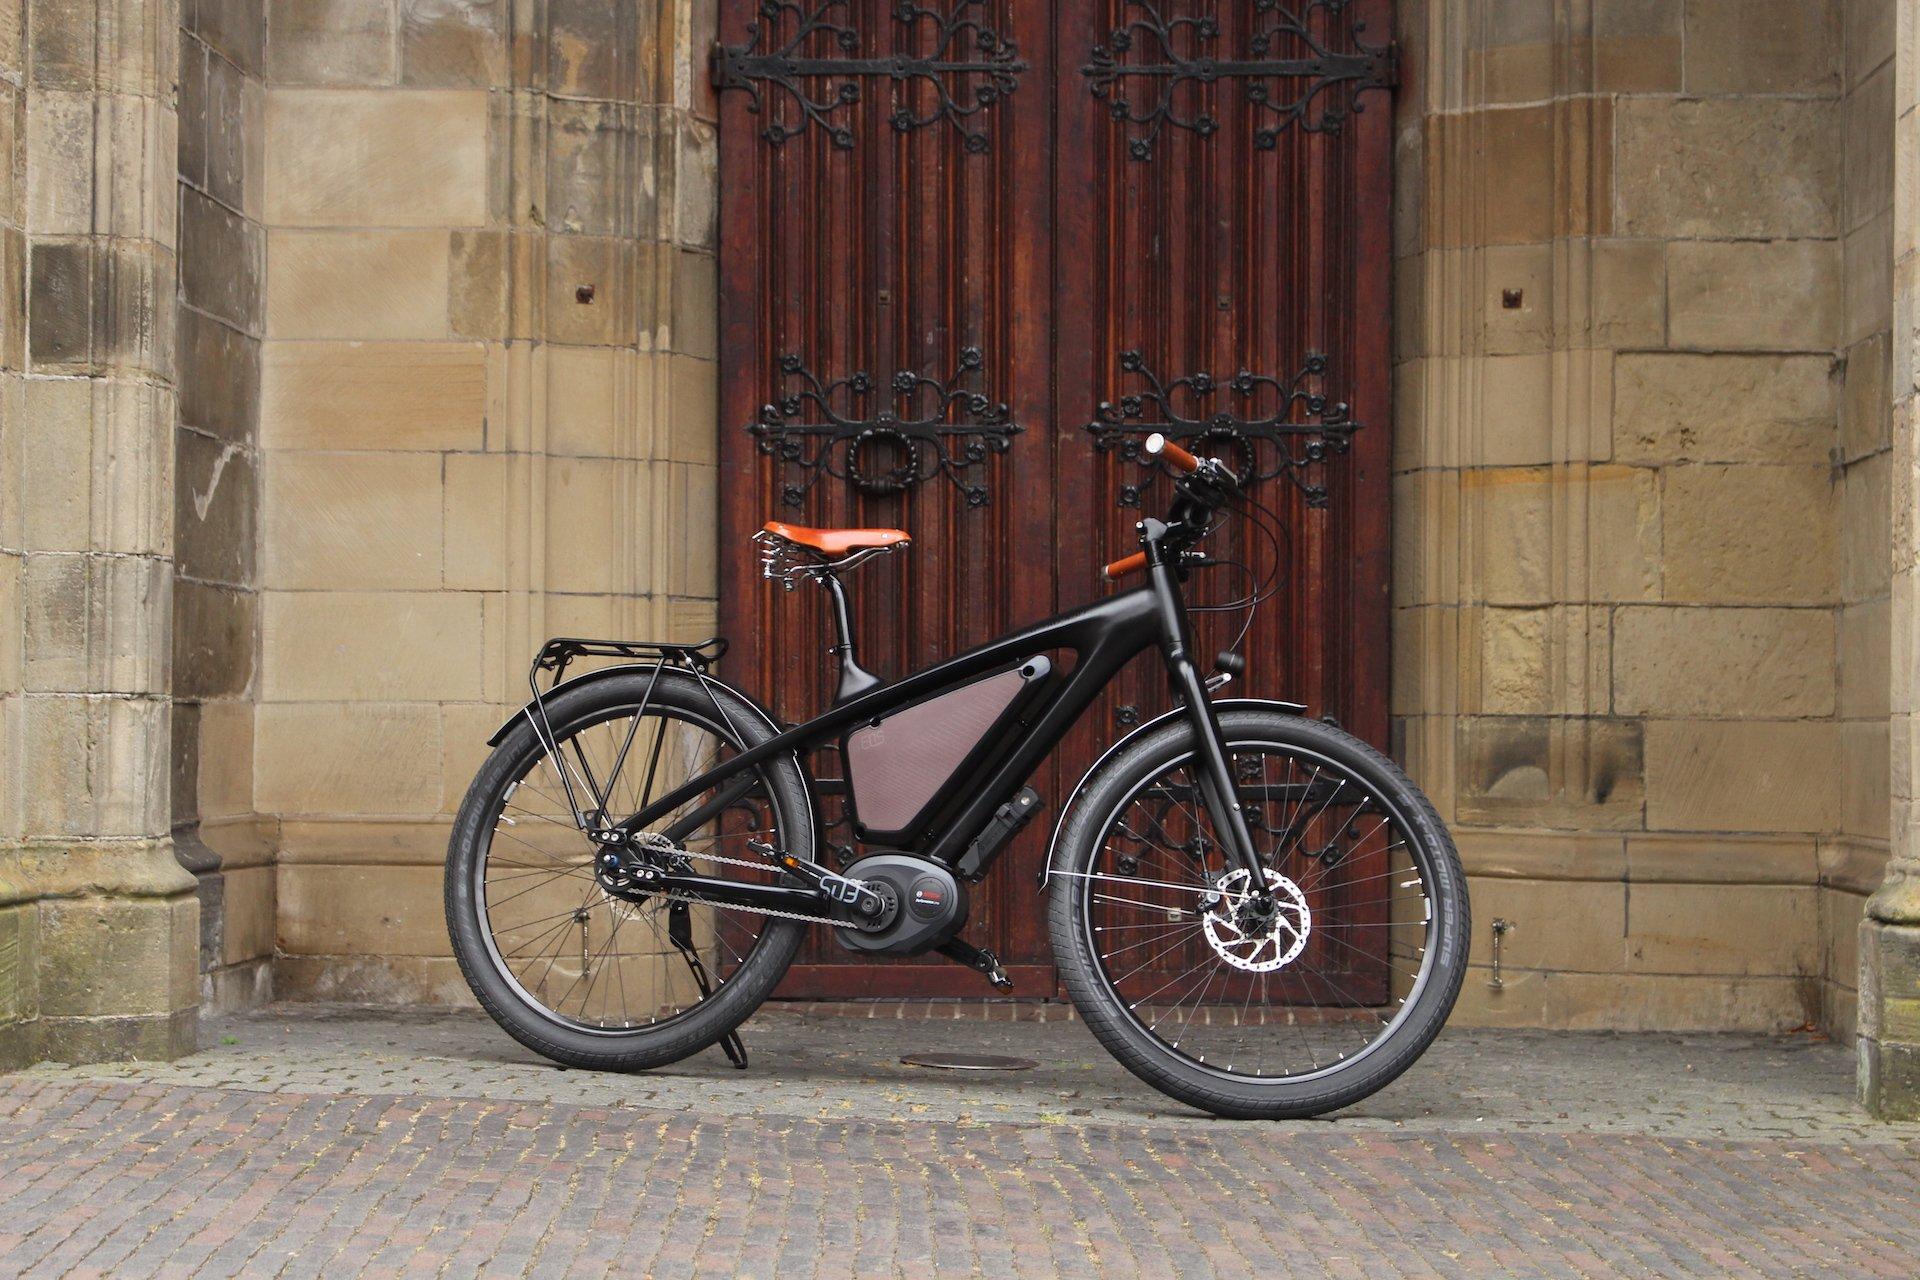 Stylish electric bike | Commuter bicycle